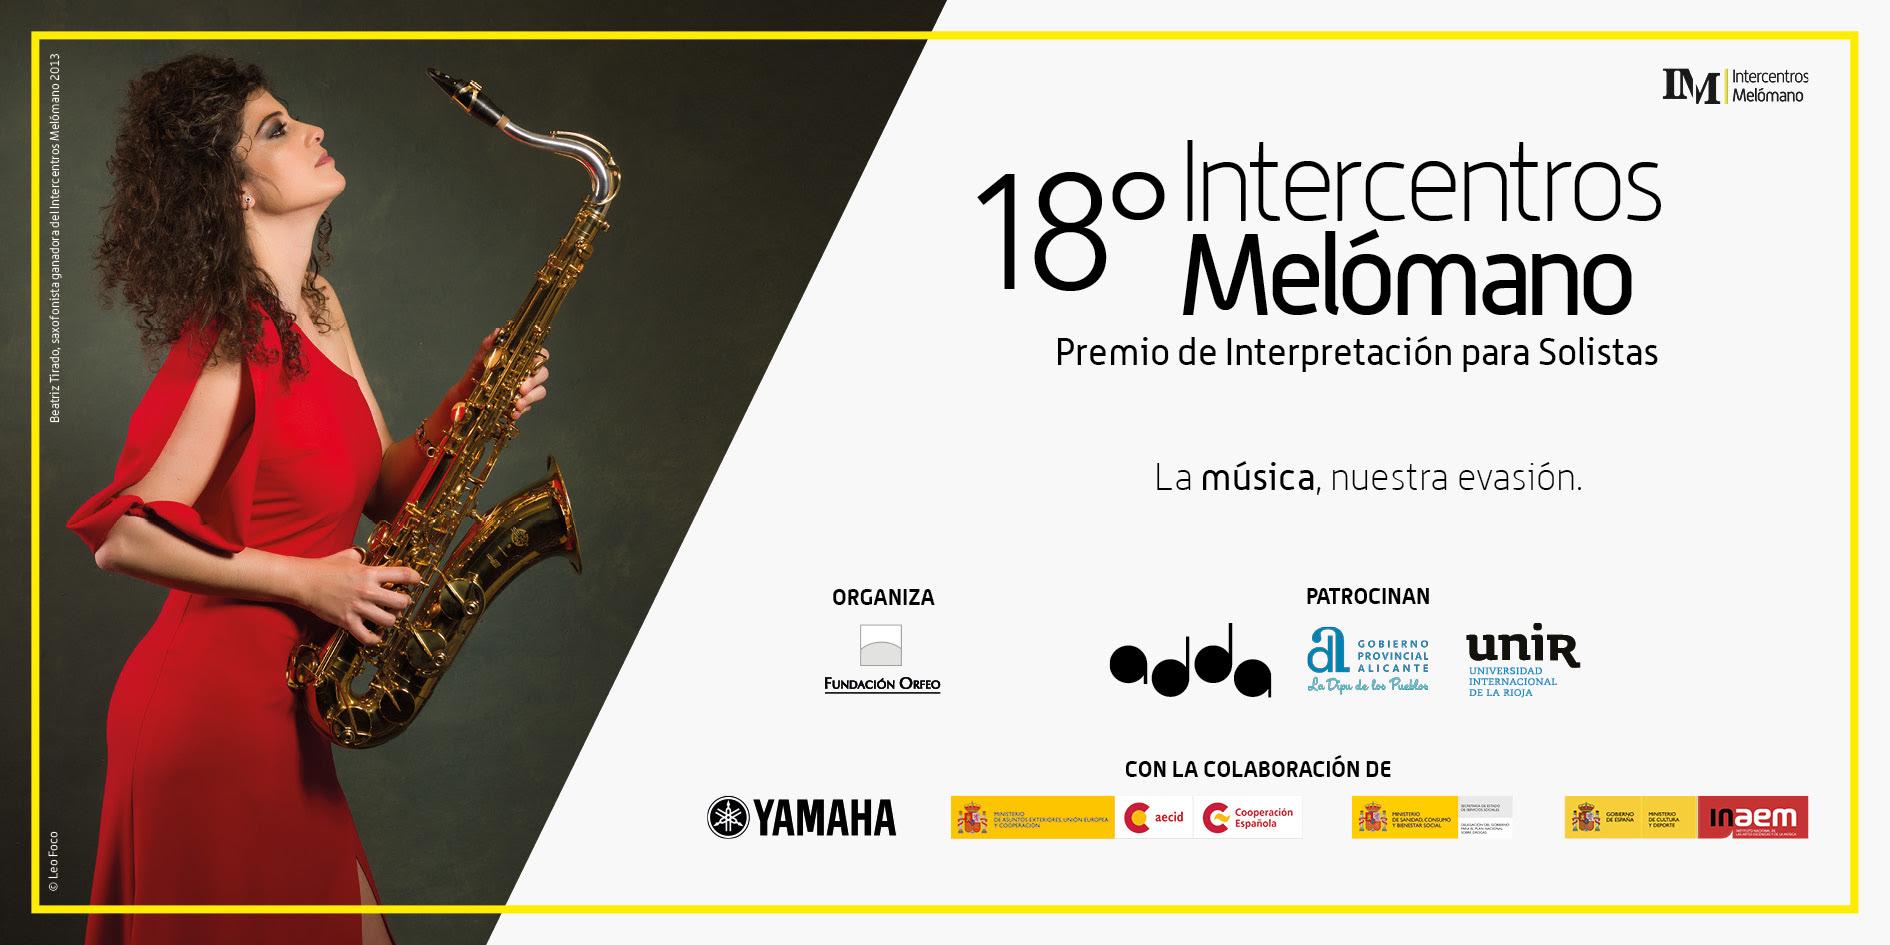 Imagen Intercentros Melómano 2019